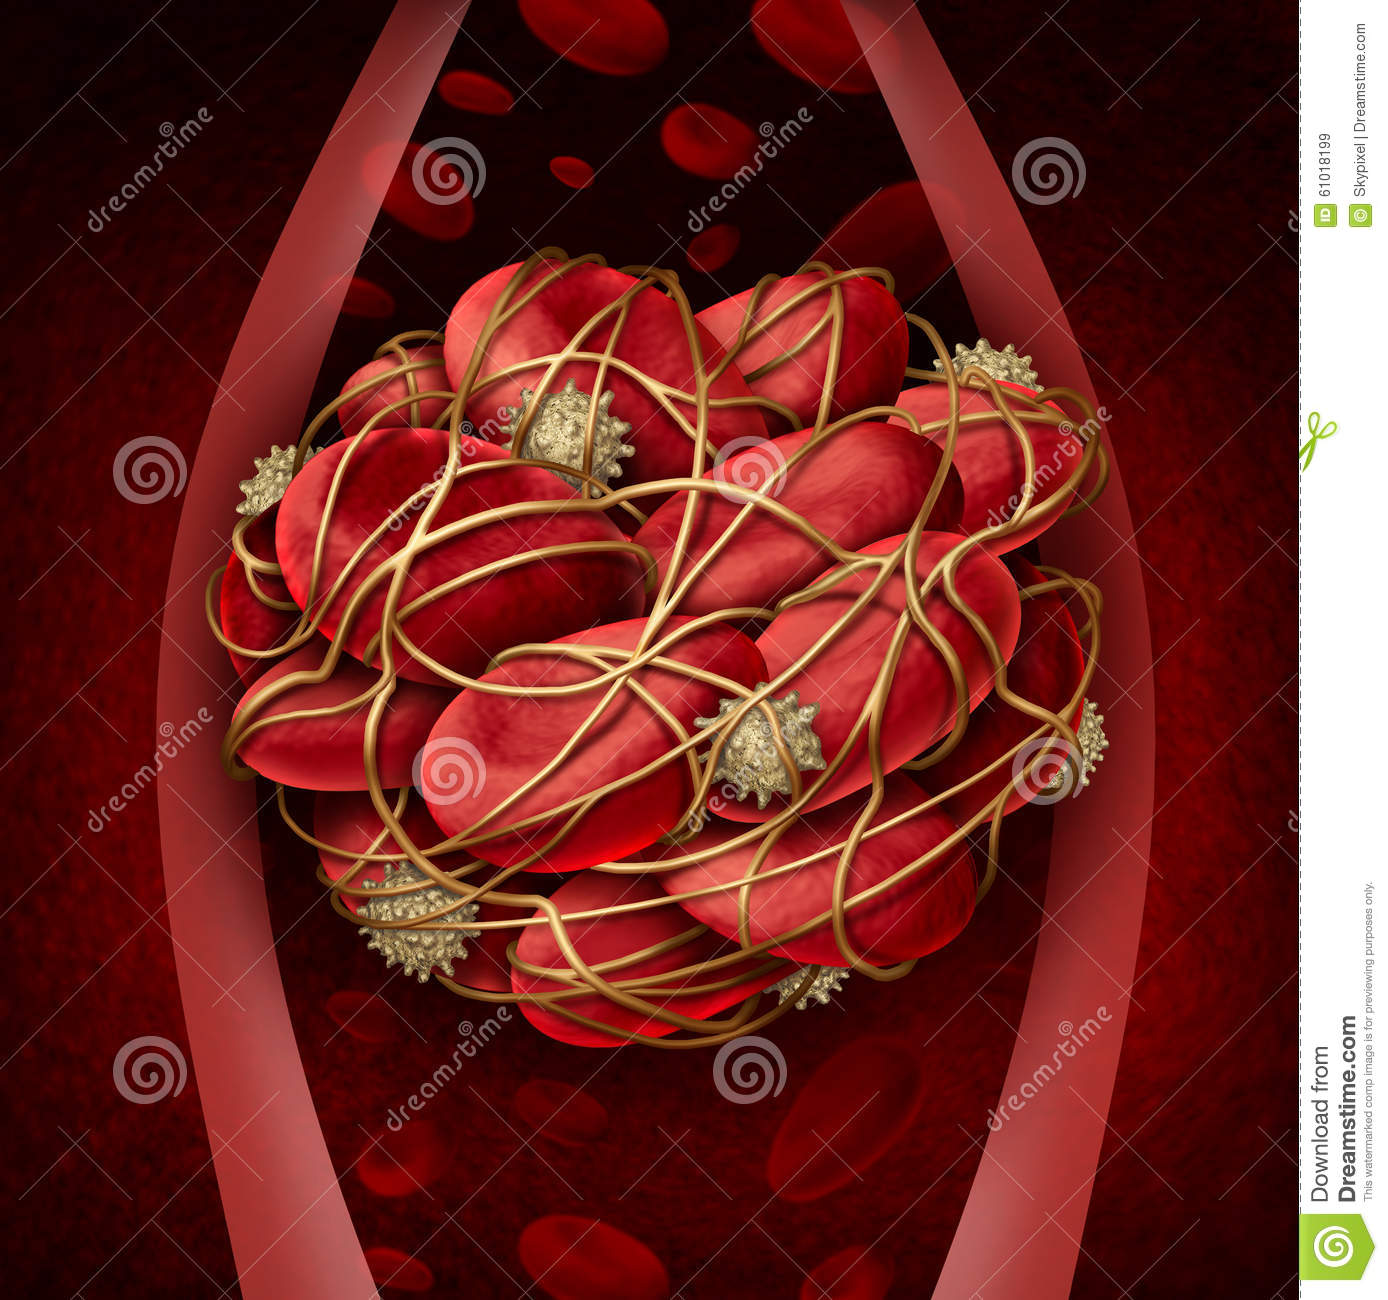 Human Blood Platelets Clip Art.